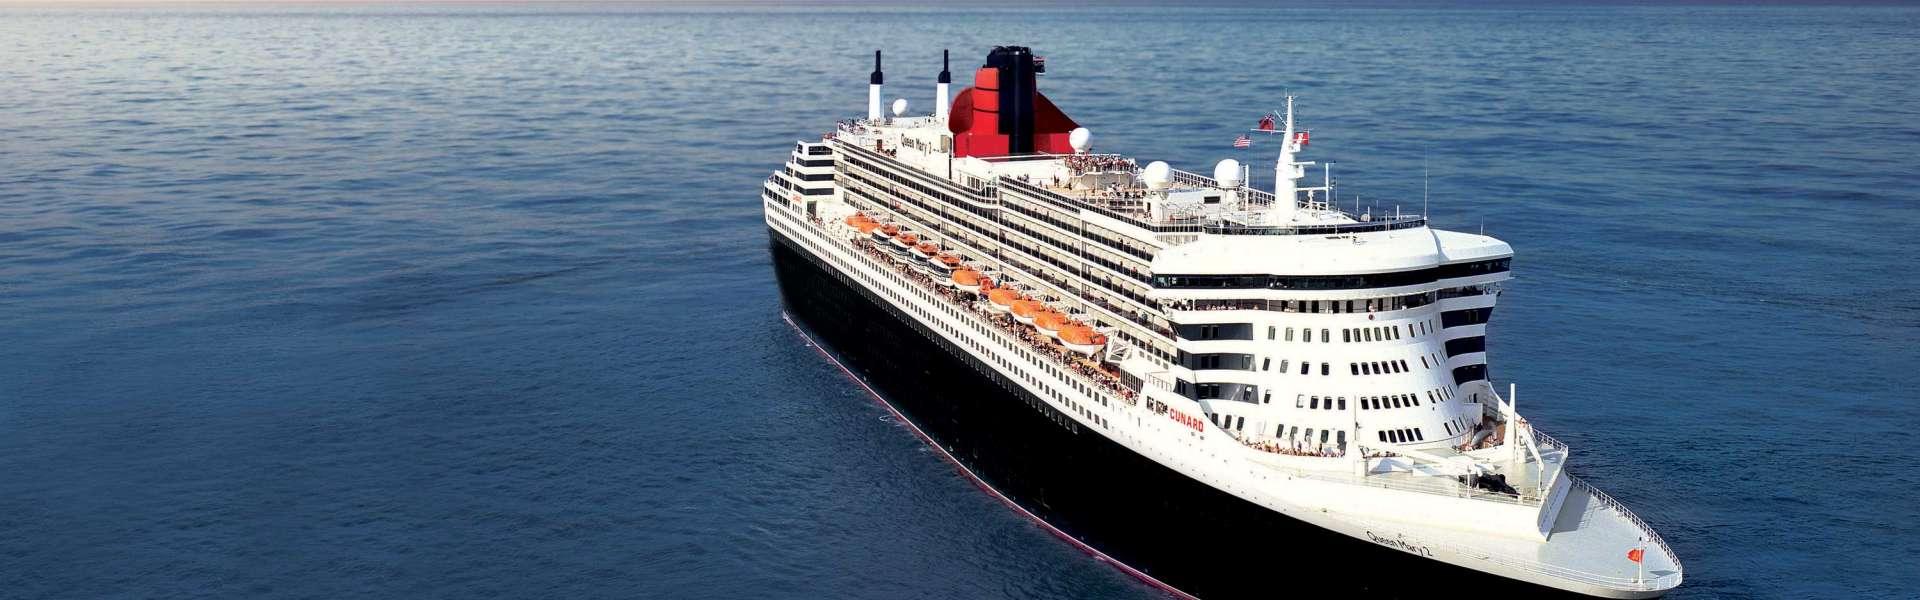 Croaziera 2019 - Transatlantic (New York) - Cunard Line - Queen Mary 2 - 7 nopti